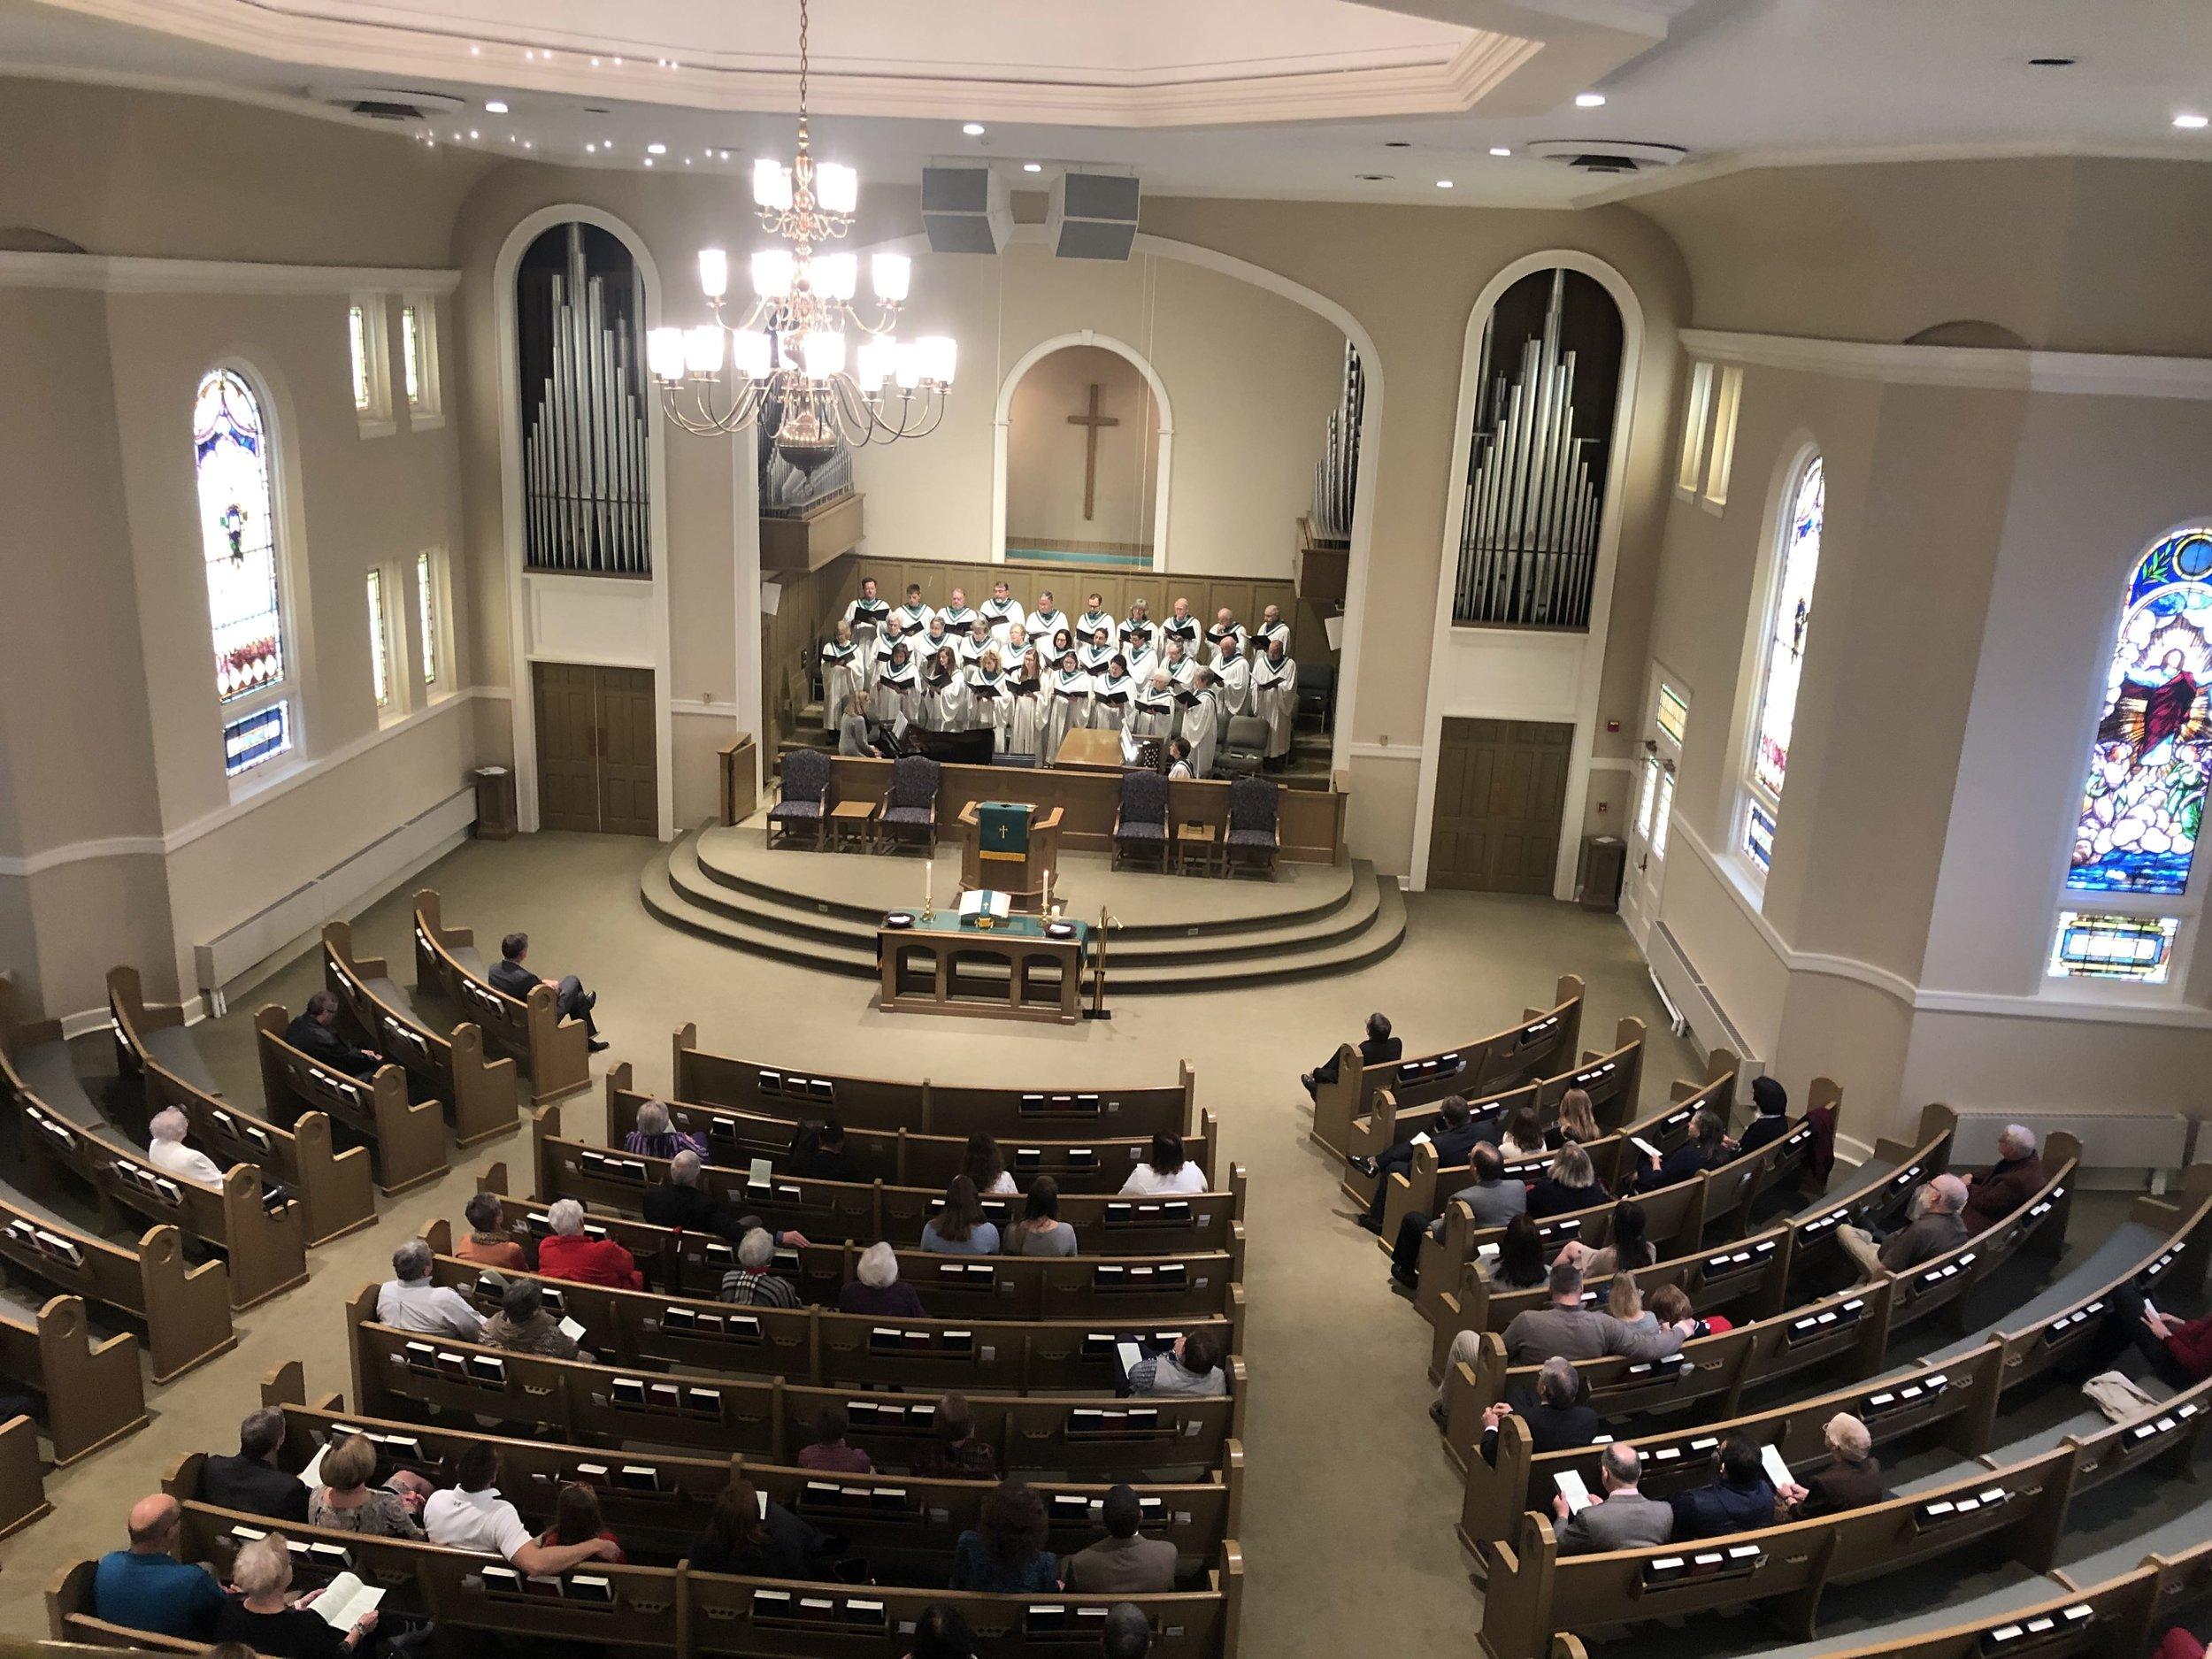 fbc albemarle - WORSHIP MINISTRY AREA